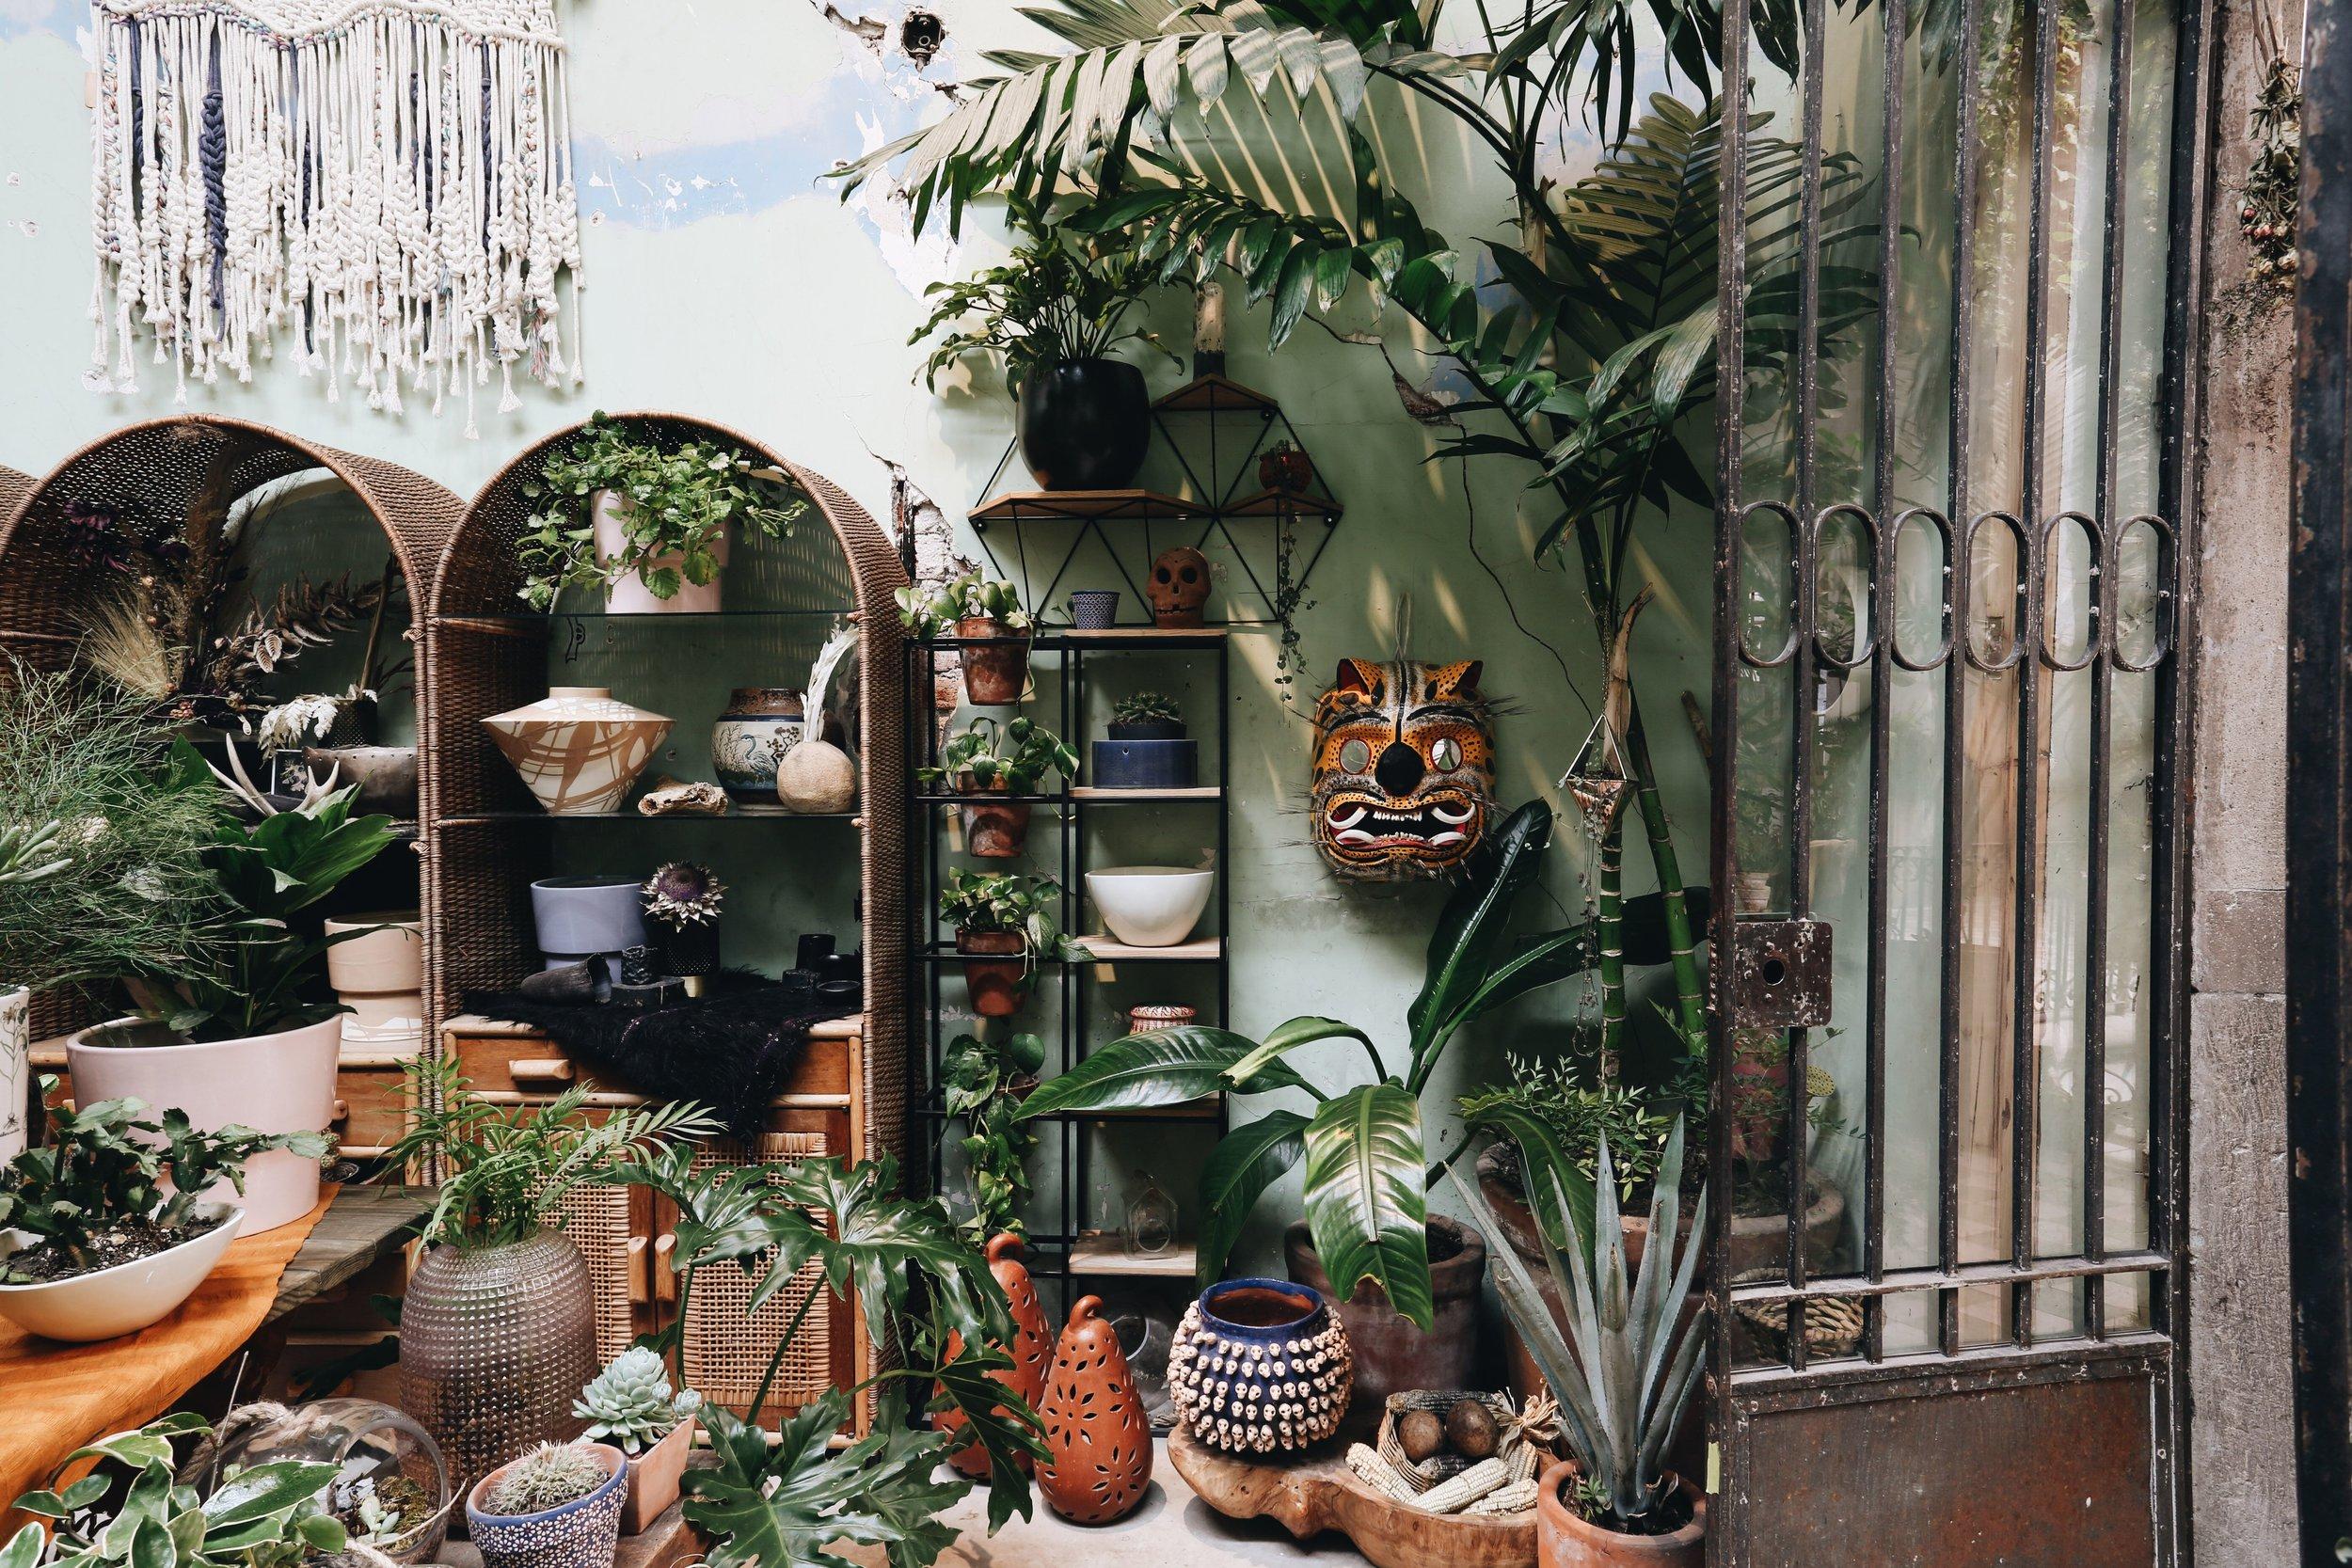 An Insider's Guide to Colonia Juárez, Mexico City's Hottest Neighborhood - Vogue